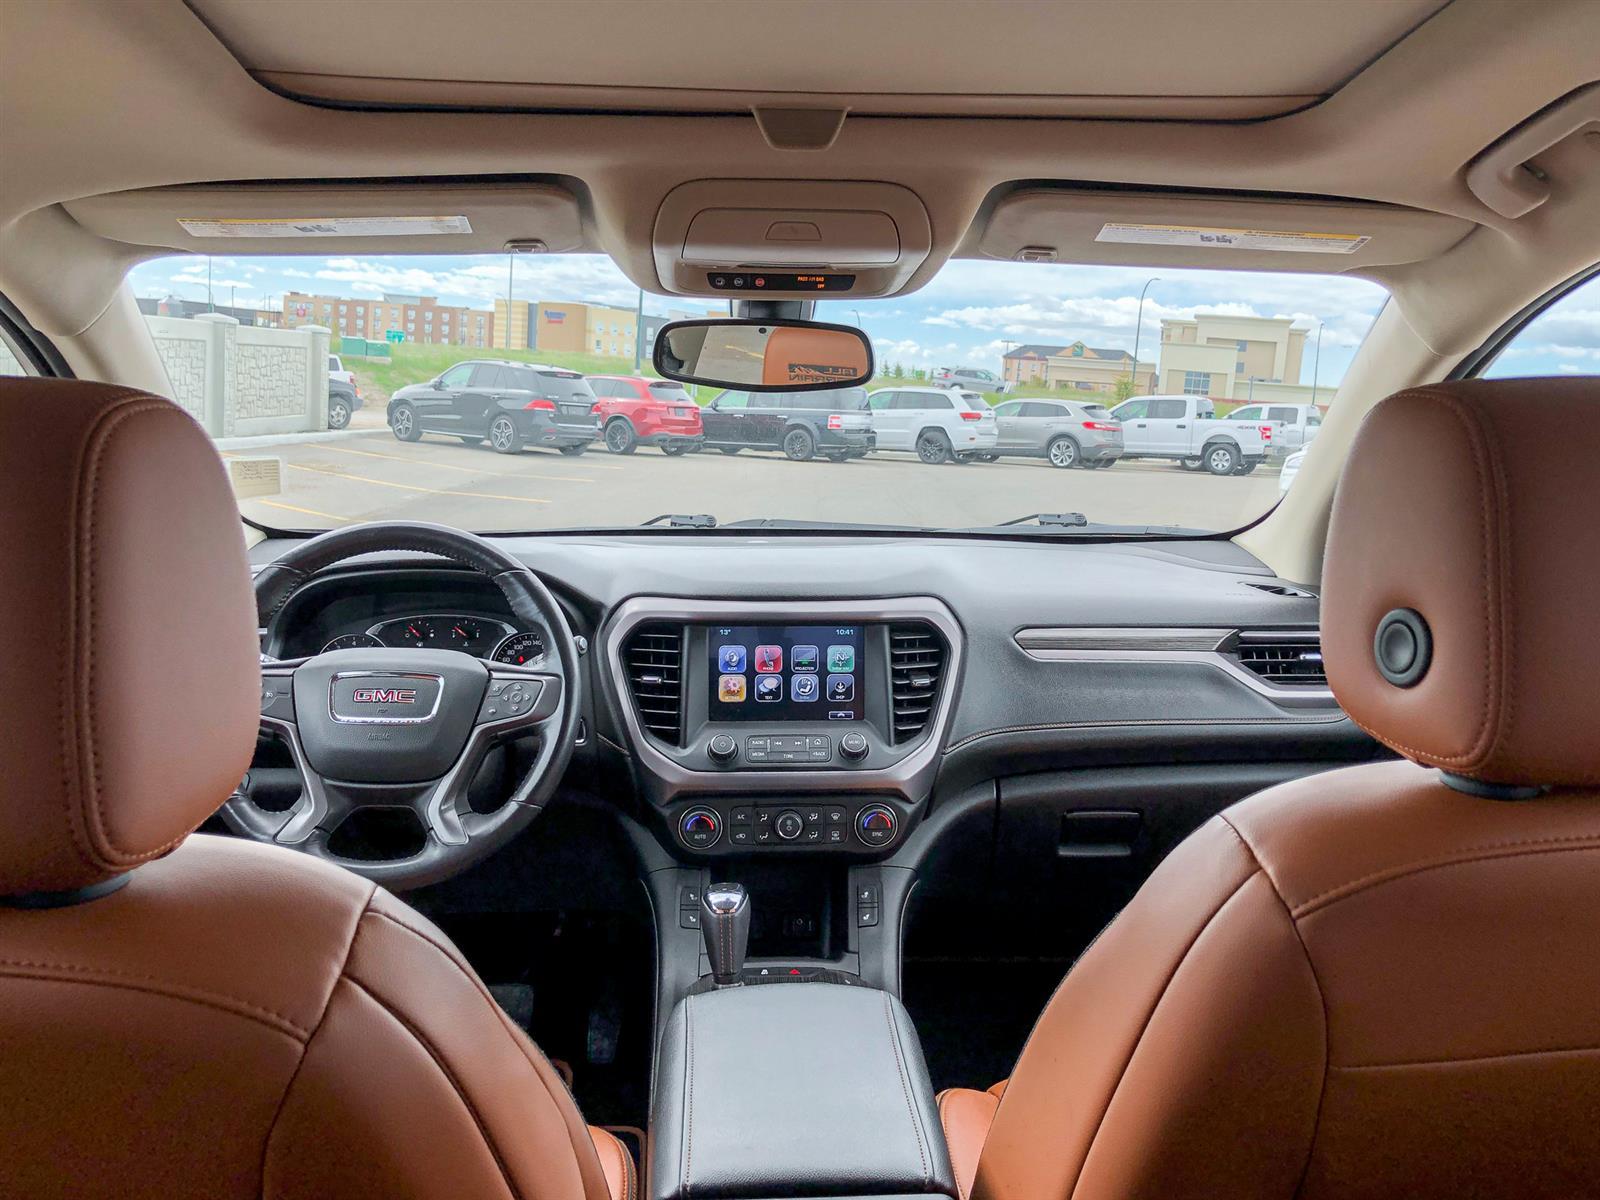 2018 GMC Acadia SLT | 3.6L V6 | AWD |  SUNROOF | POWERED/HEATED SEATS